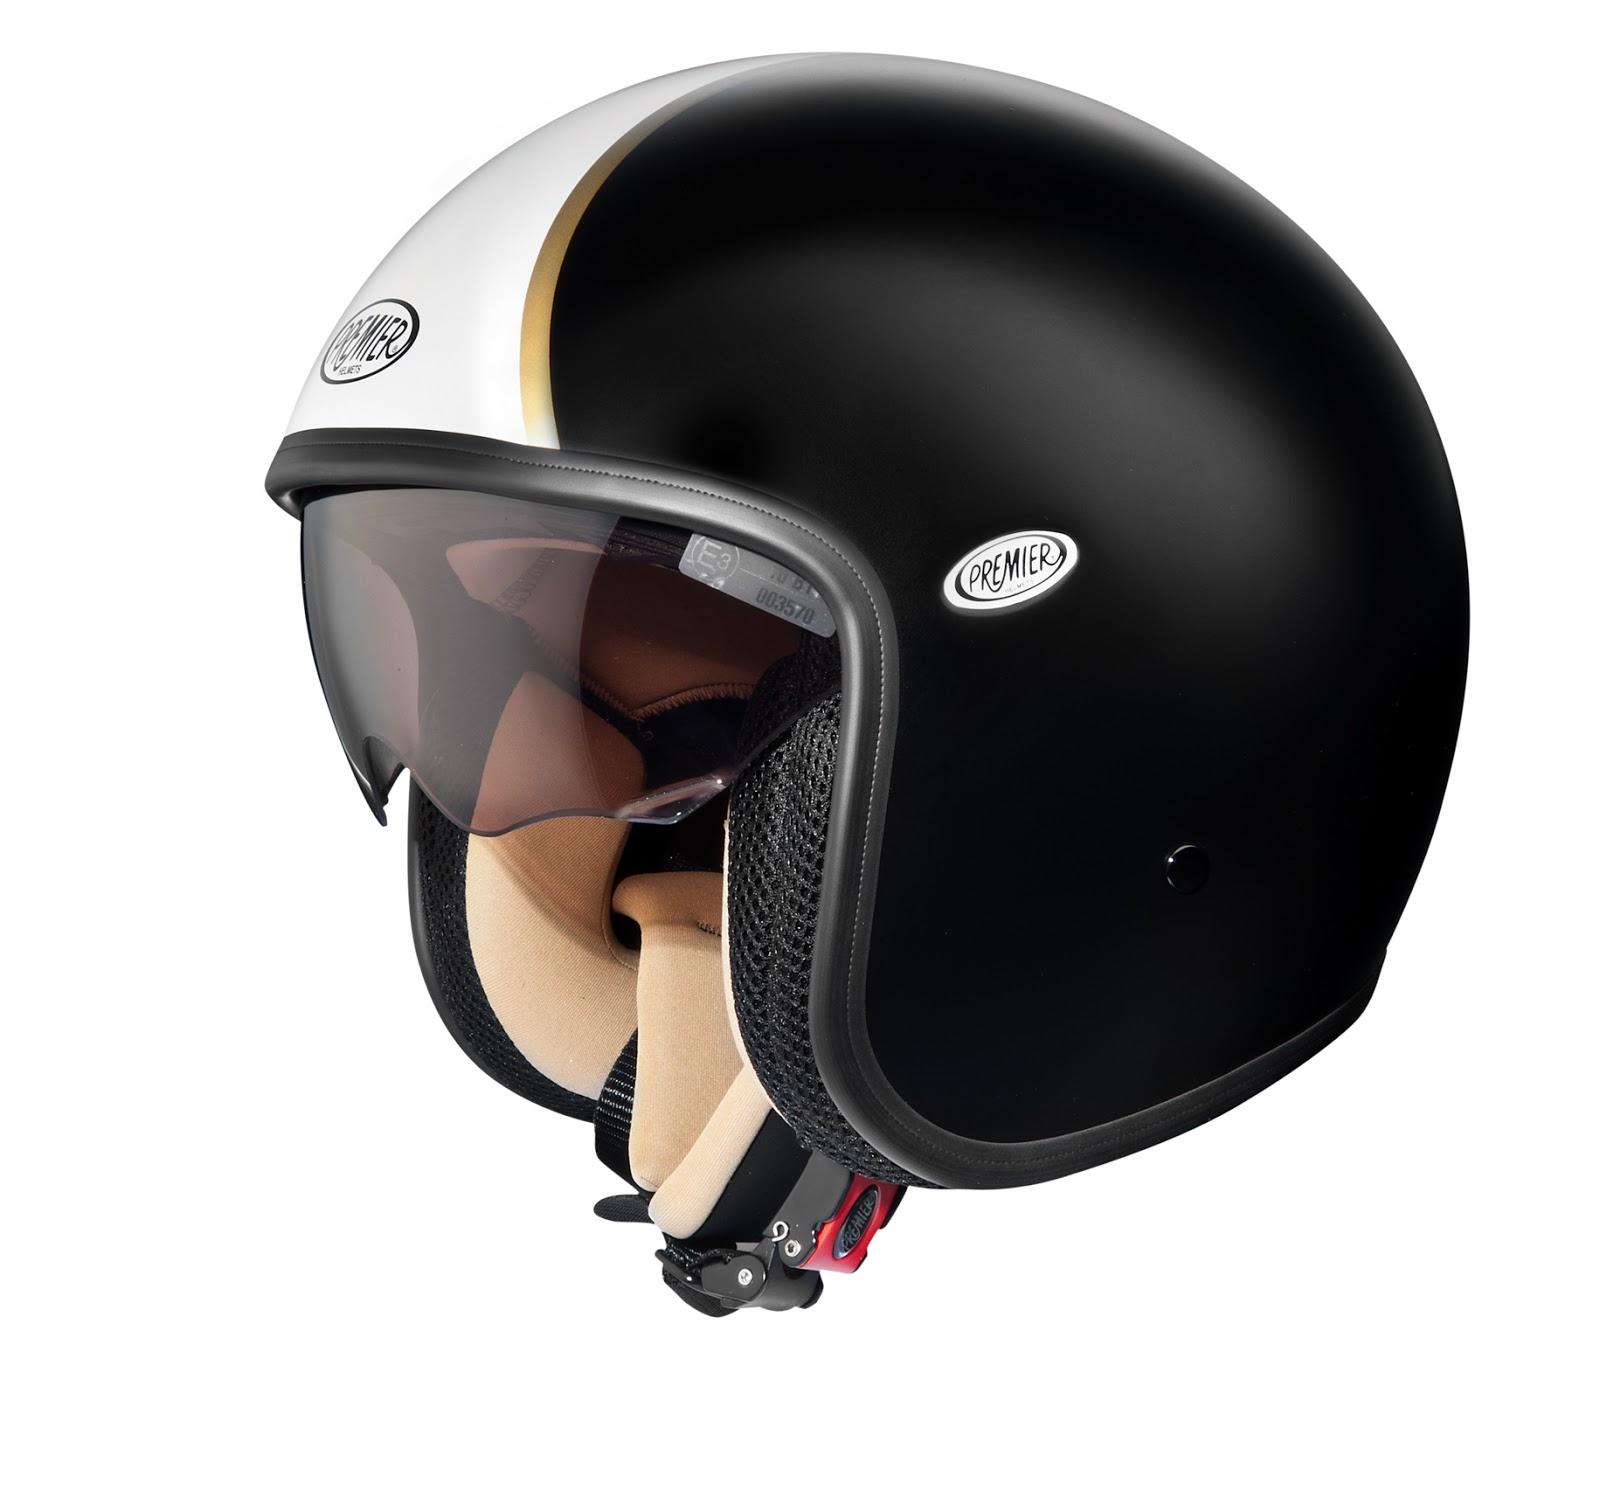 Premier Helmets Go Vintage, Look Amazing - autoevolution